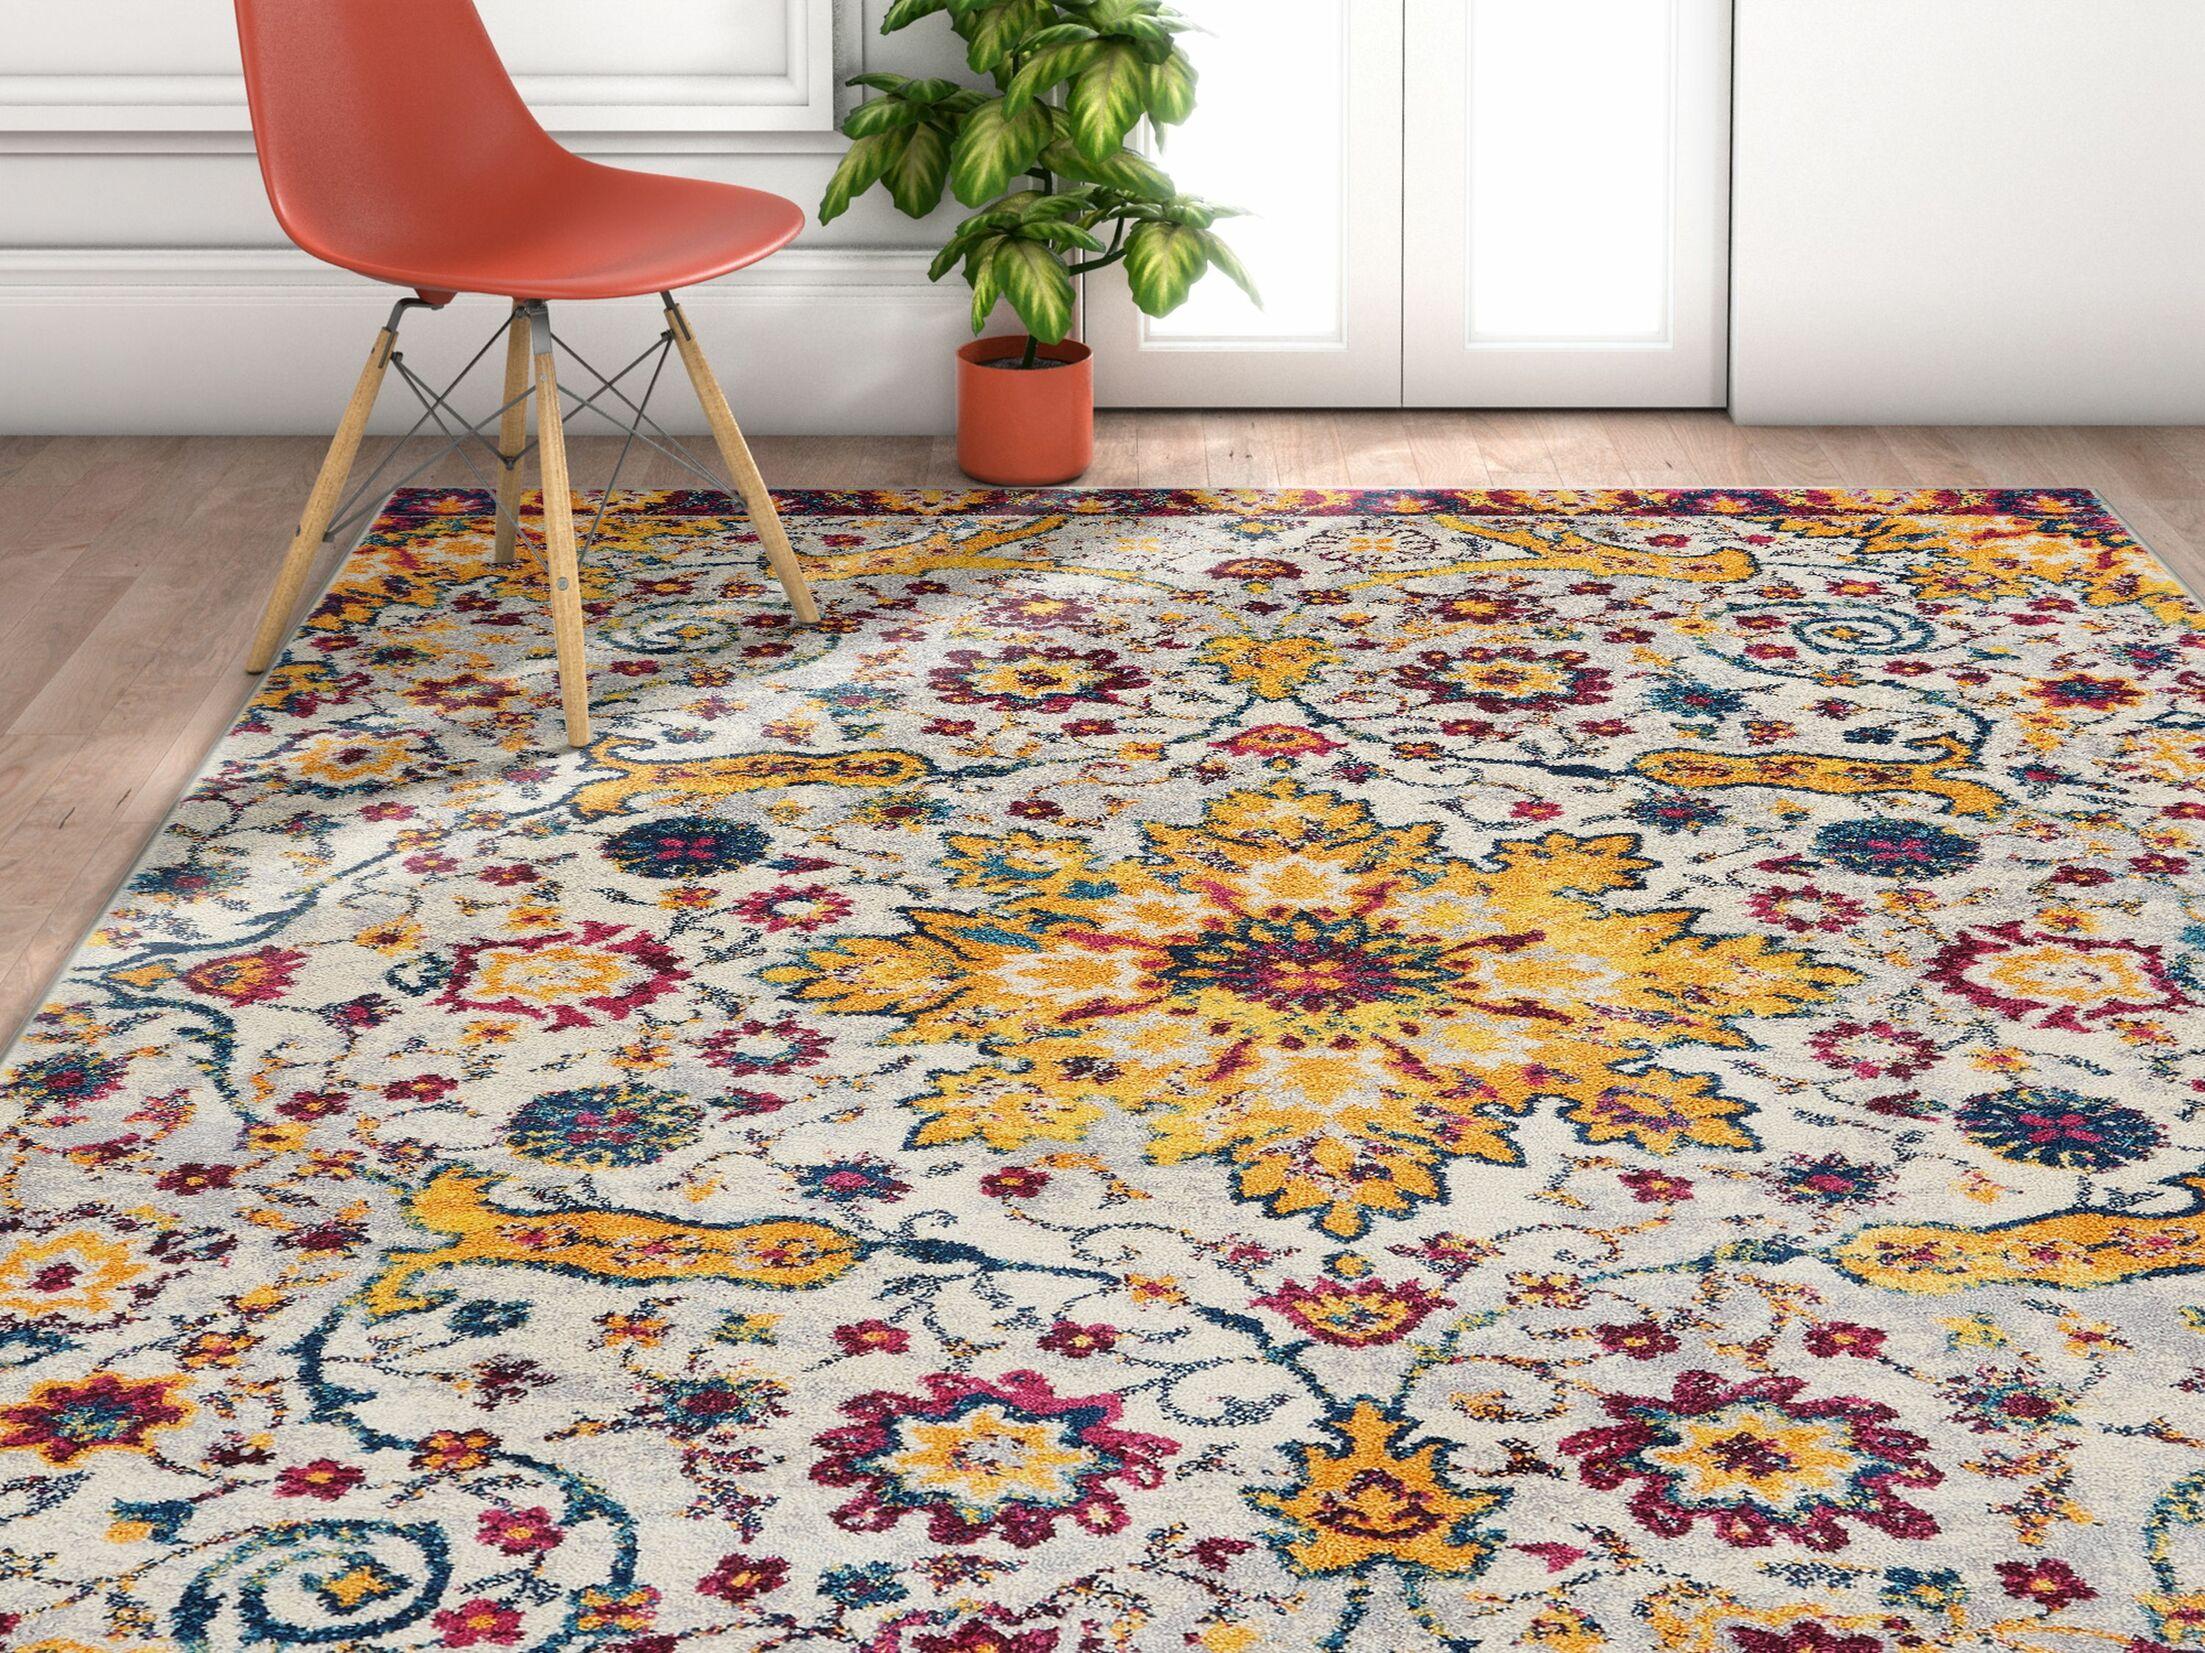 Binstead Wonderly Modern Persian Oriental Floral Gold Area Rug Rug Size: Rectangle 5'3